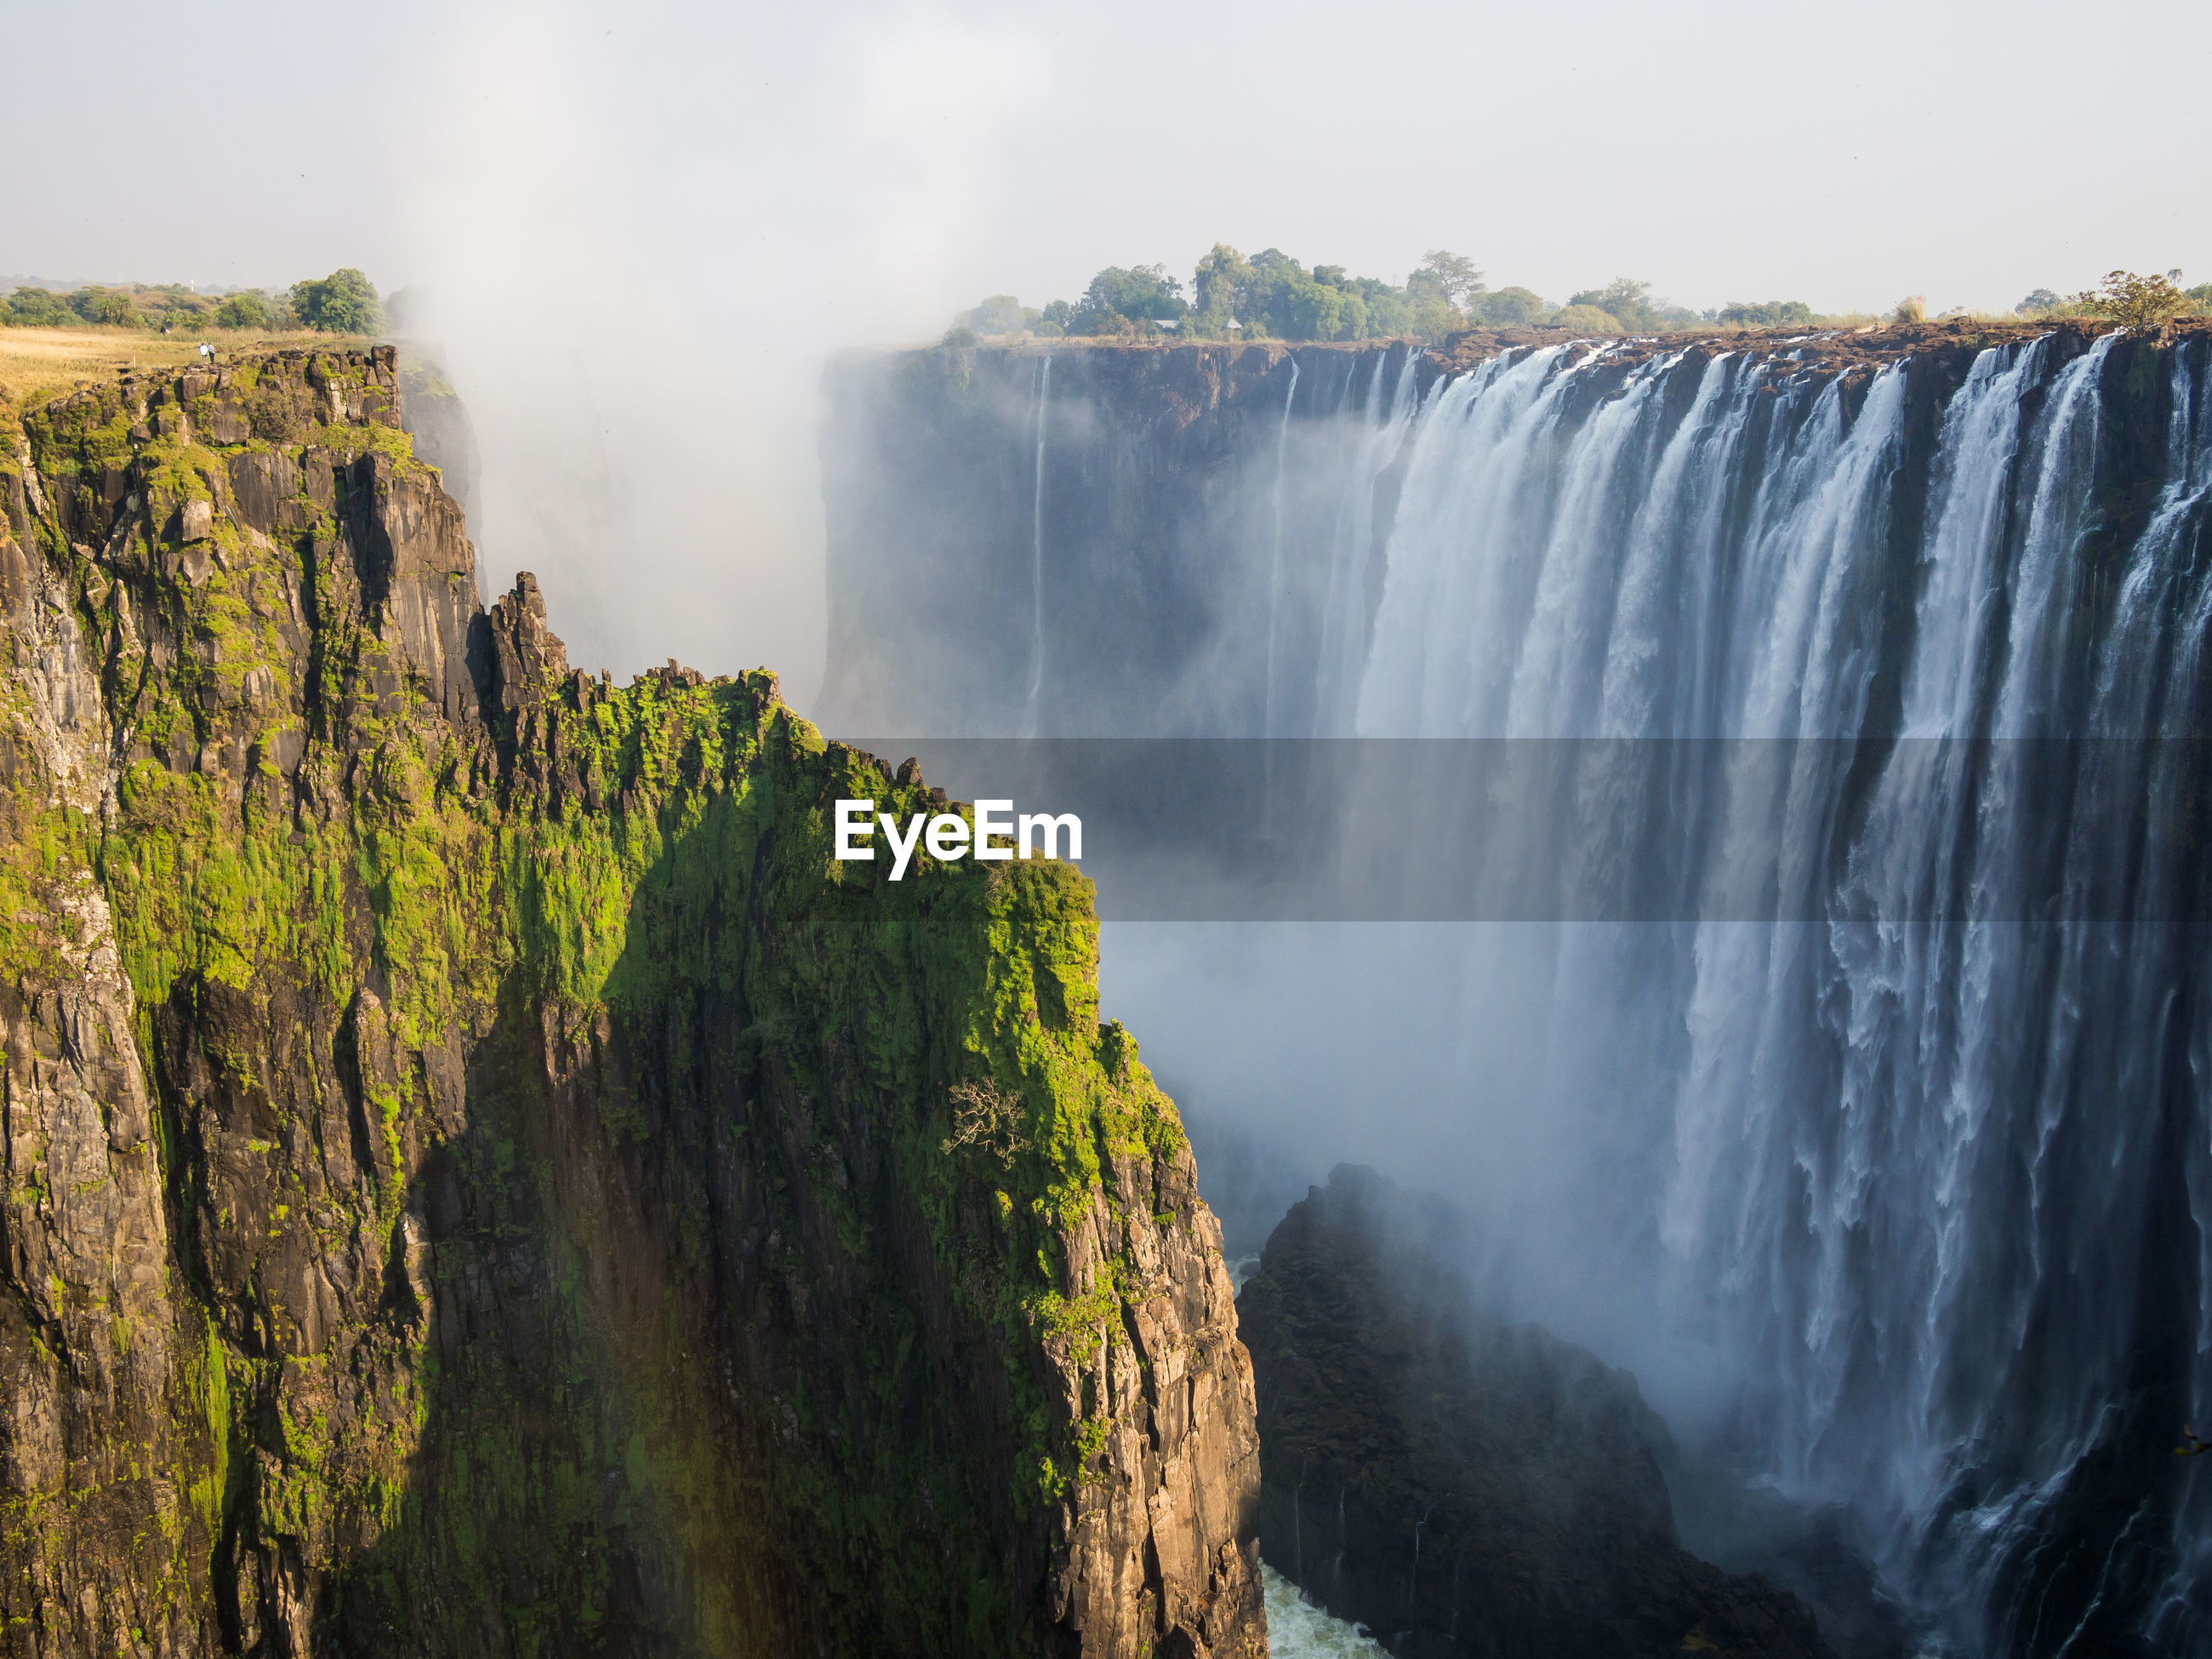 Scenic view of victoria falls waterfall at border between zambia and zimbabwe